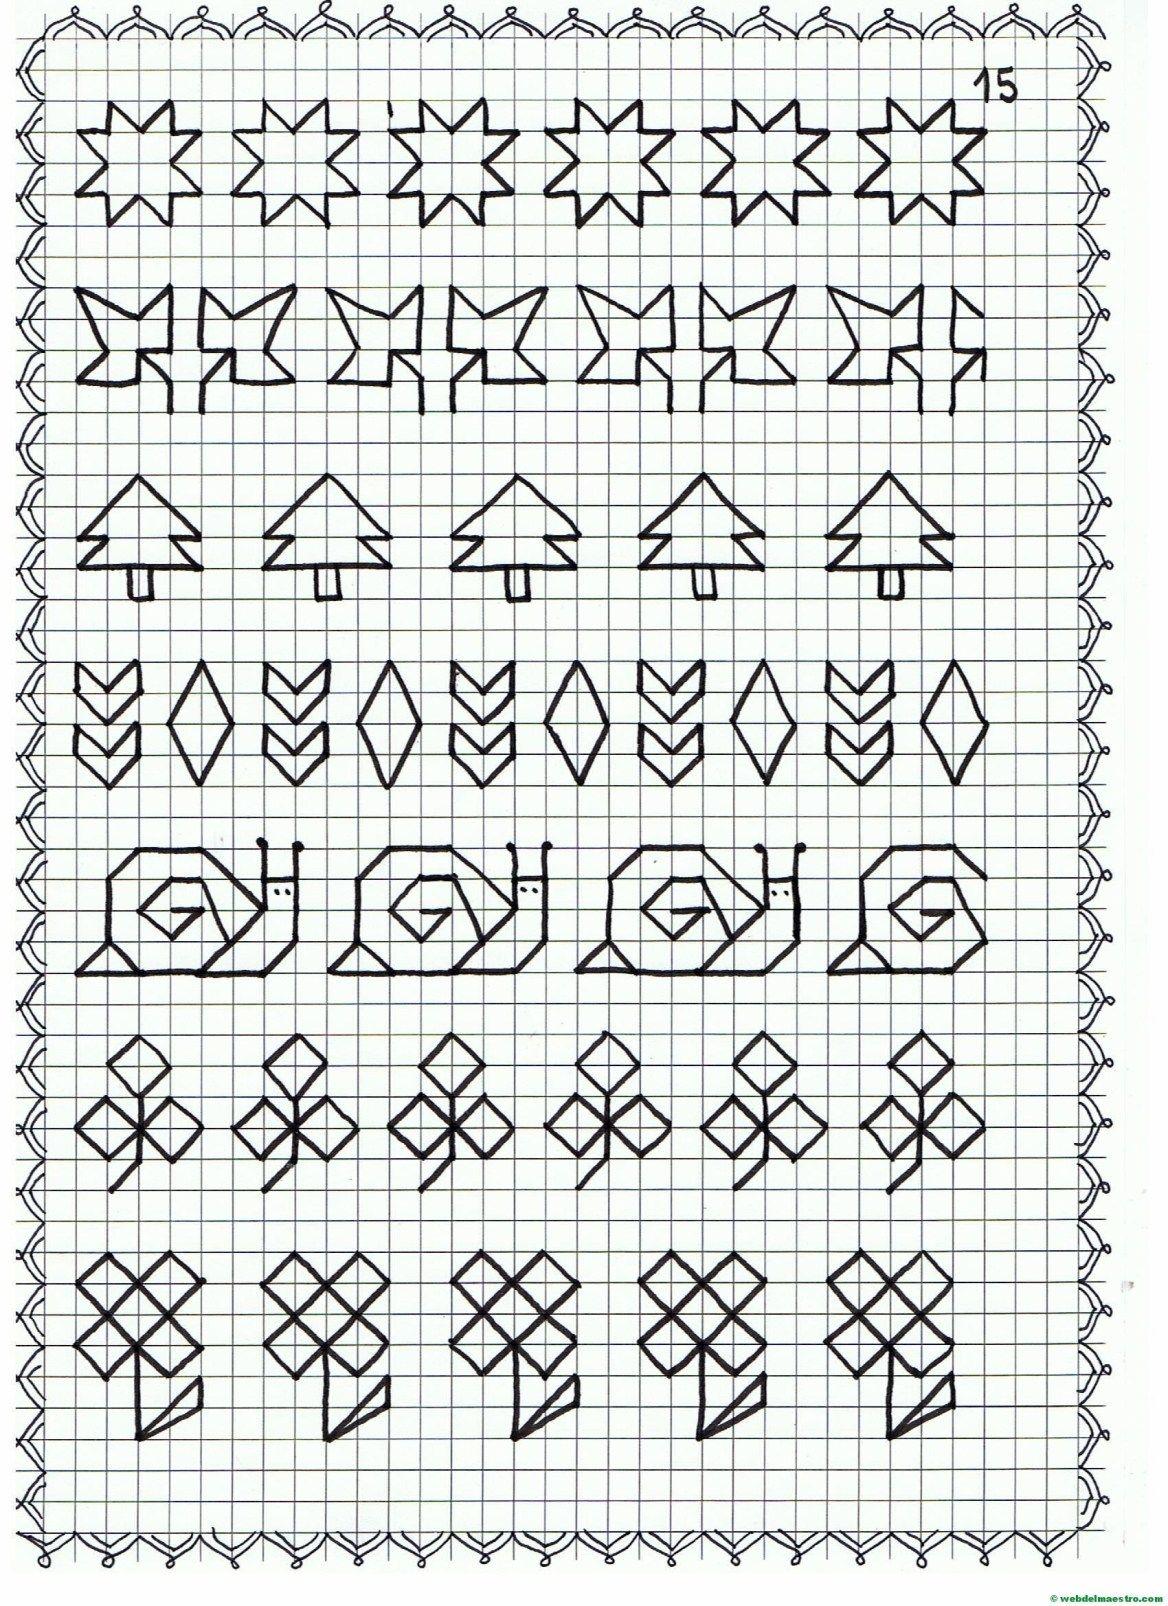 Cenefas Dibujos En Cuadricula Para Imprimir Web Del Maestro Dibujos En Cuadricula Cuadricula Para Dibujar Cuadricula